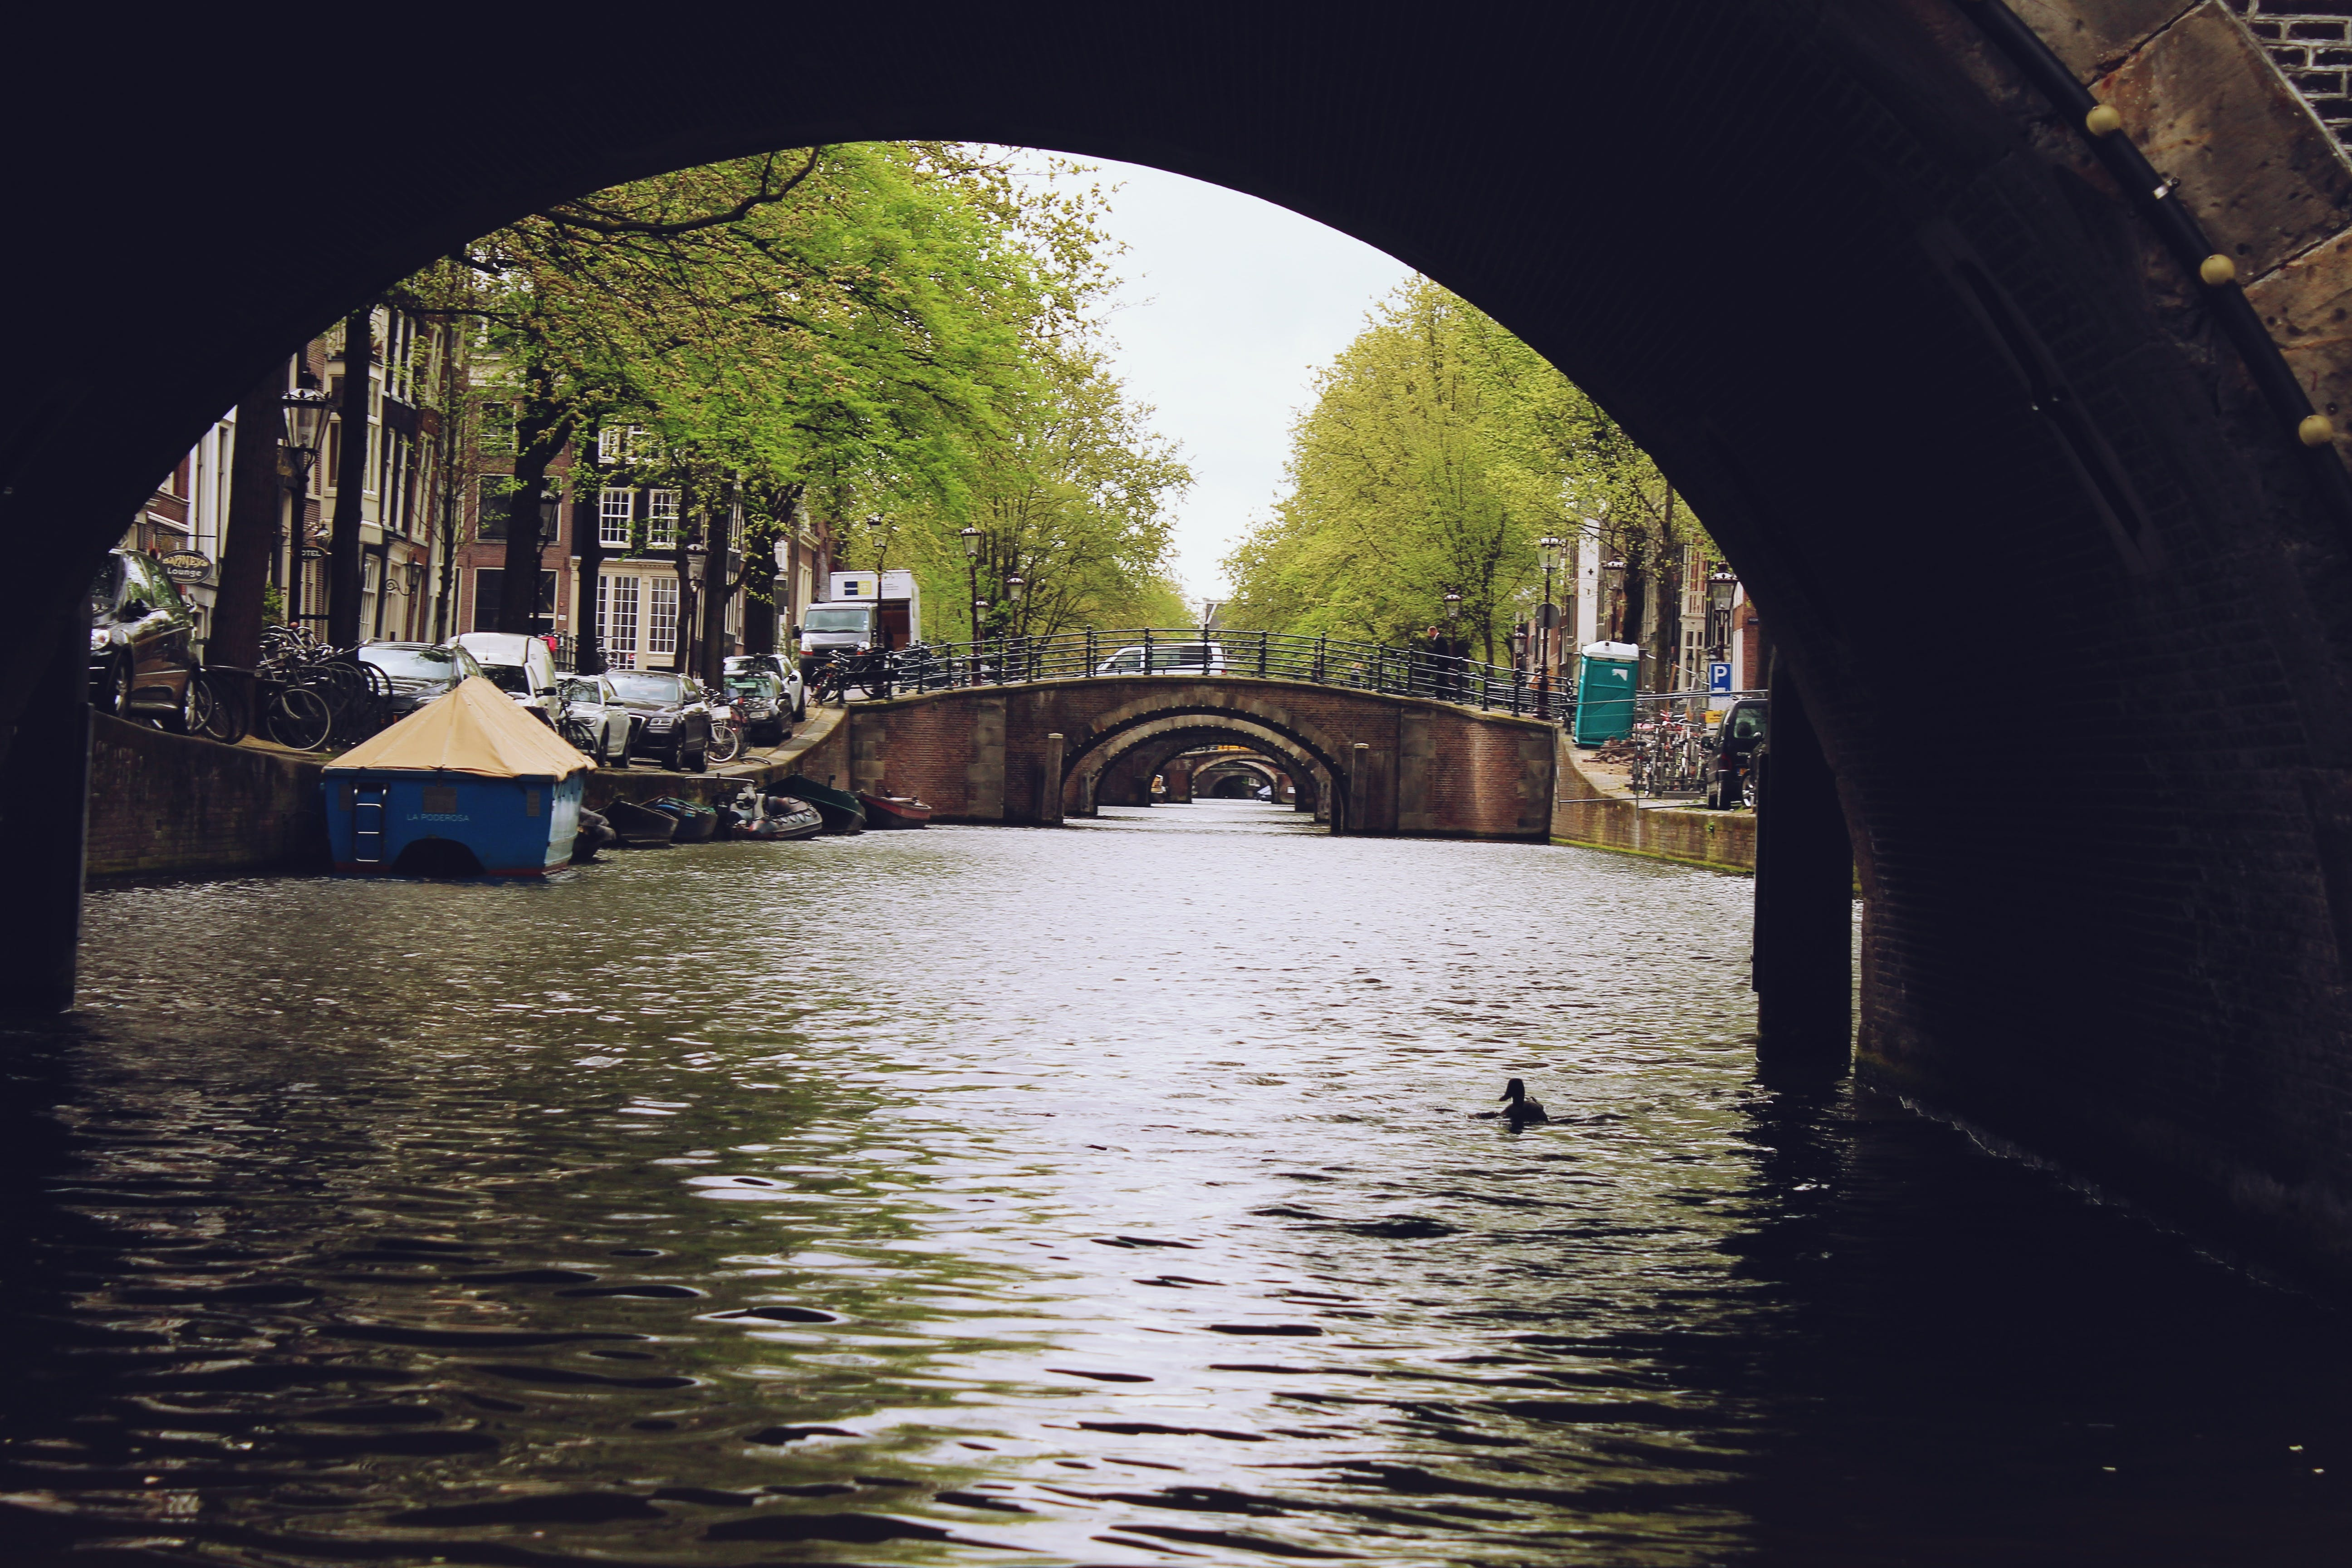 Gratis stockfoto met Amsterdam, boom, h2o, kanaal